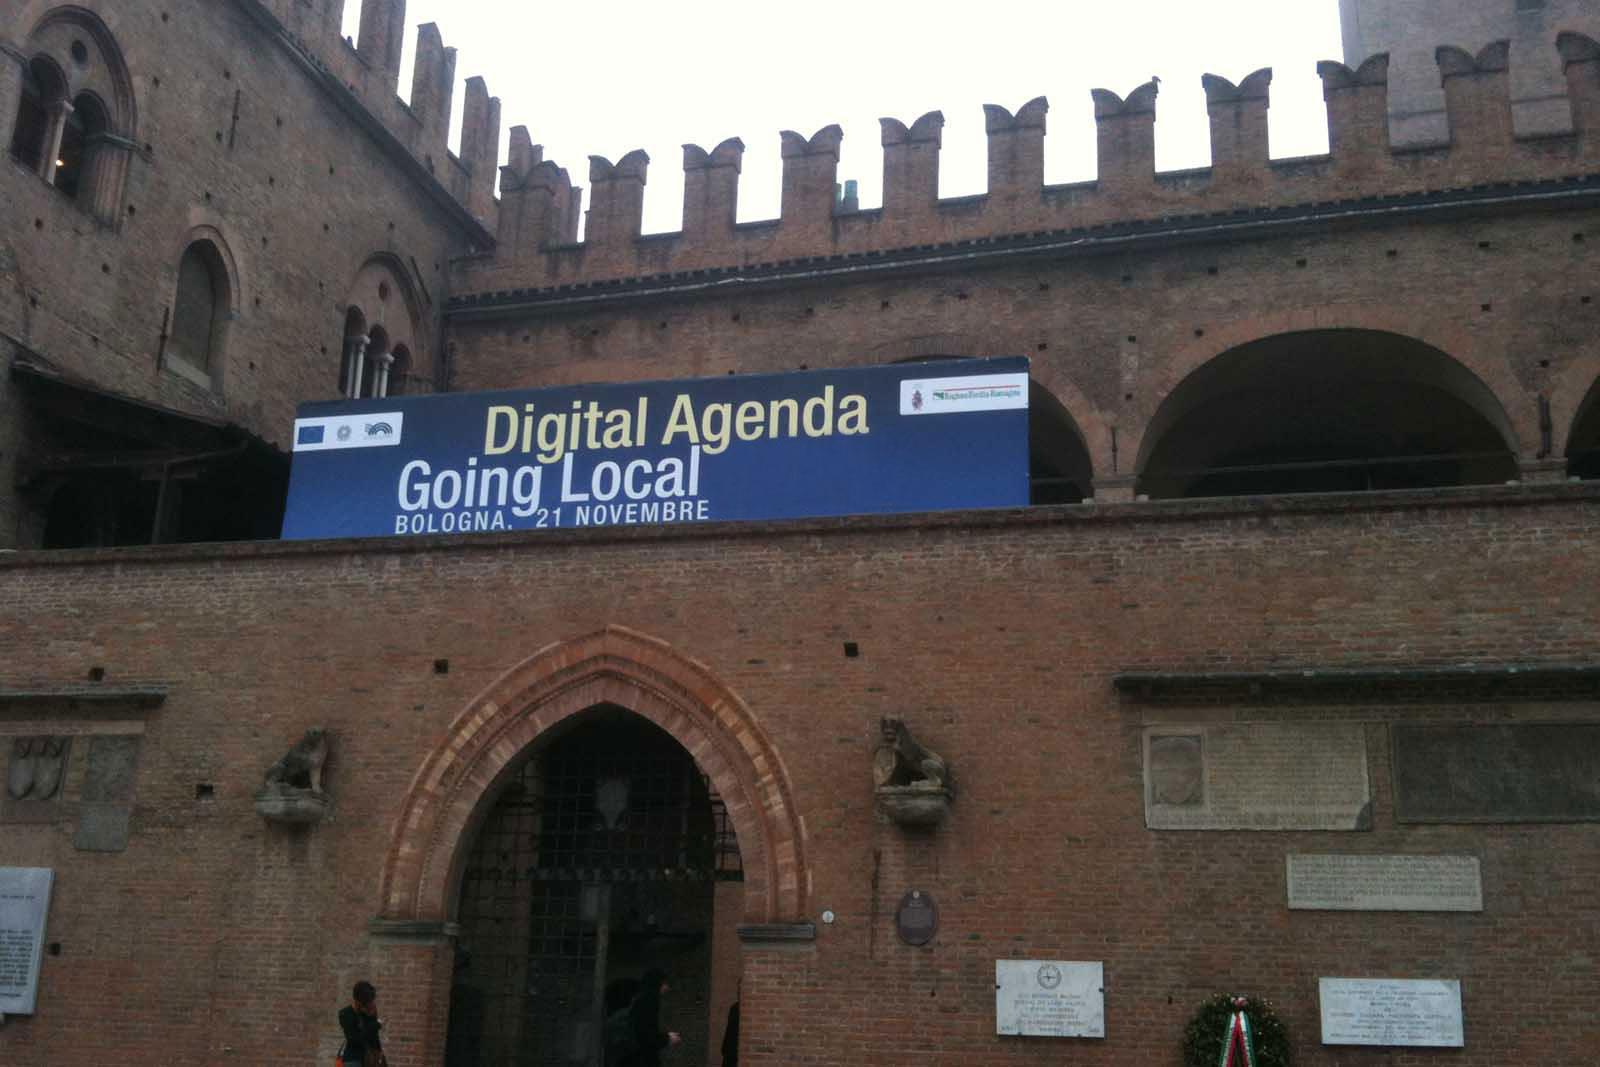 Absolut-Regione-Emilia-Romagna-convegno-nazionale-3